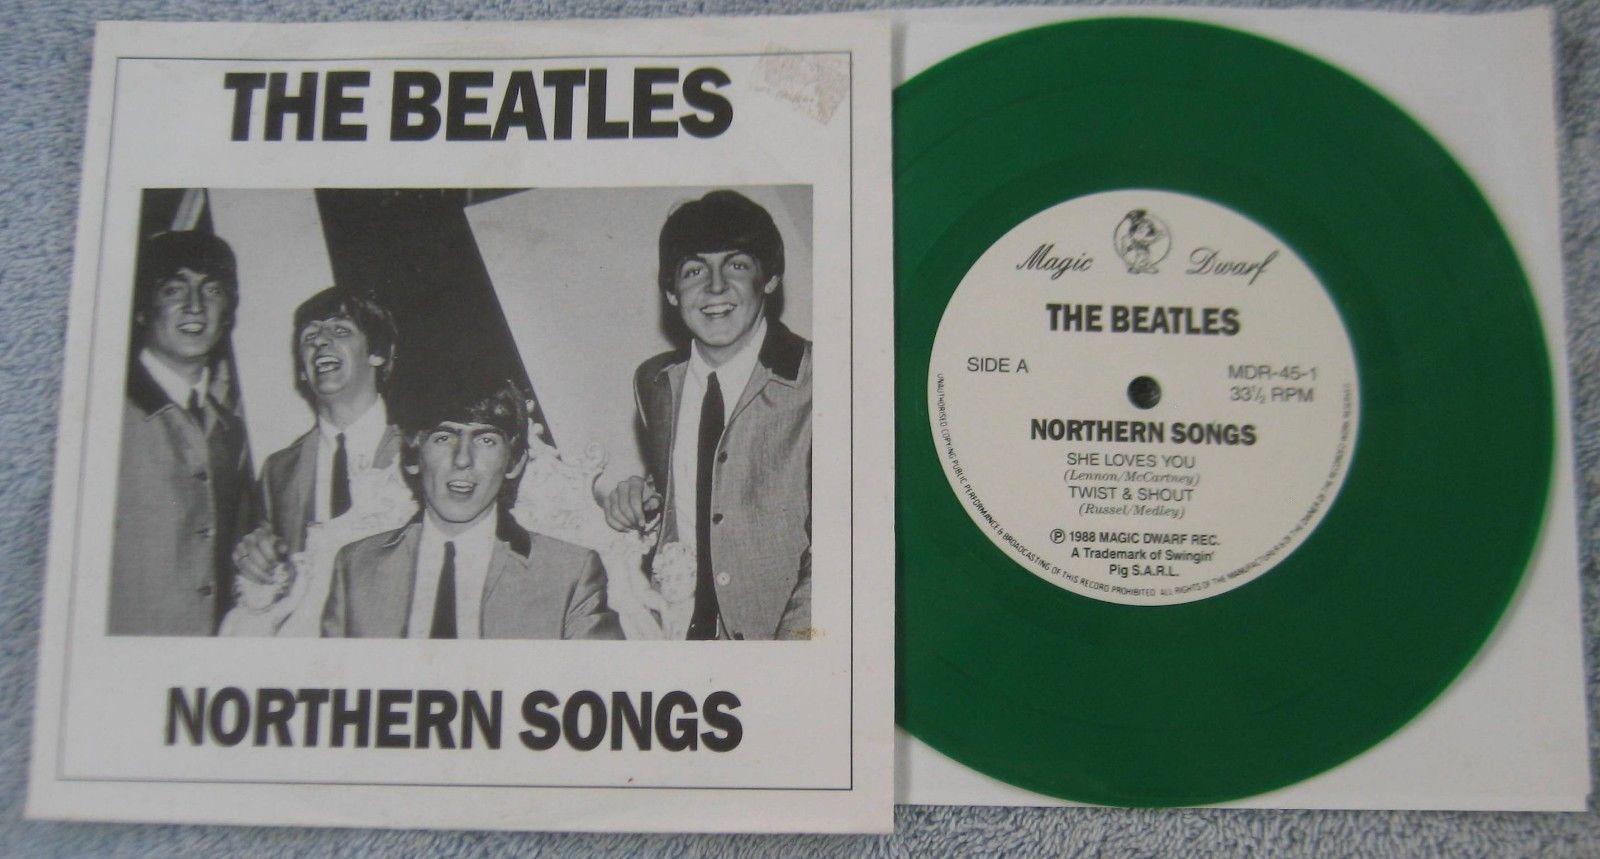 The Beatles A Hard Days Night No. 2 Australian 7 vinyl